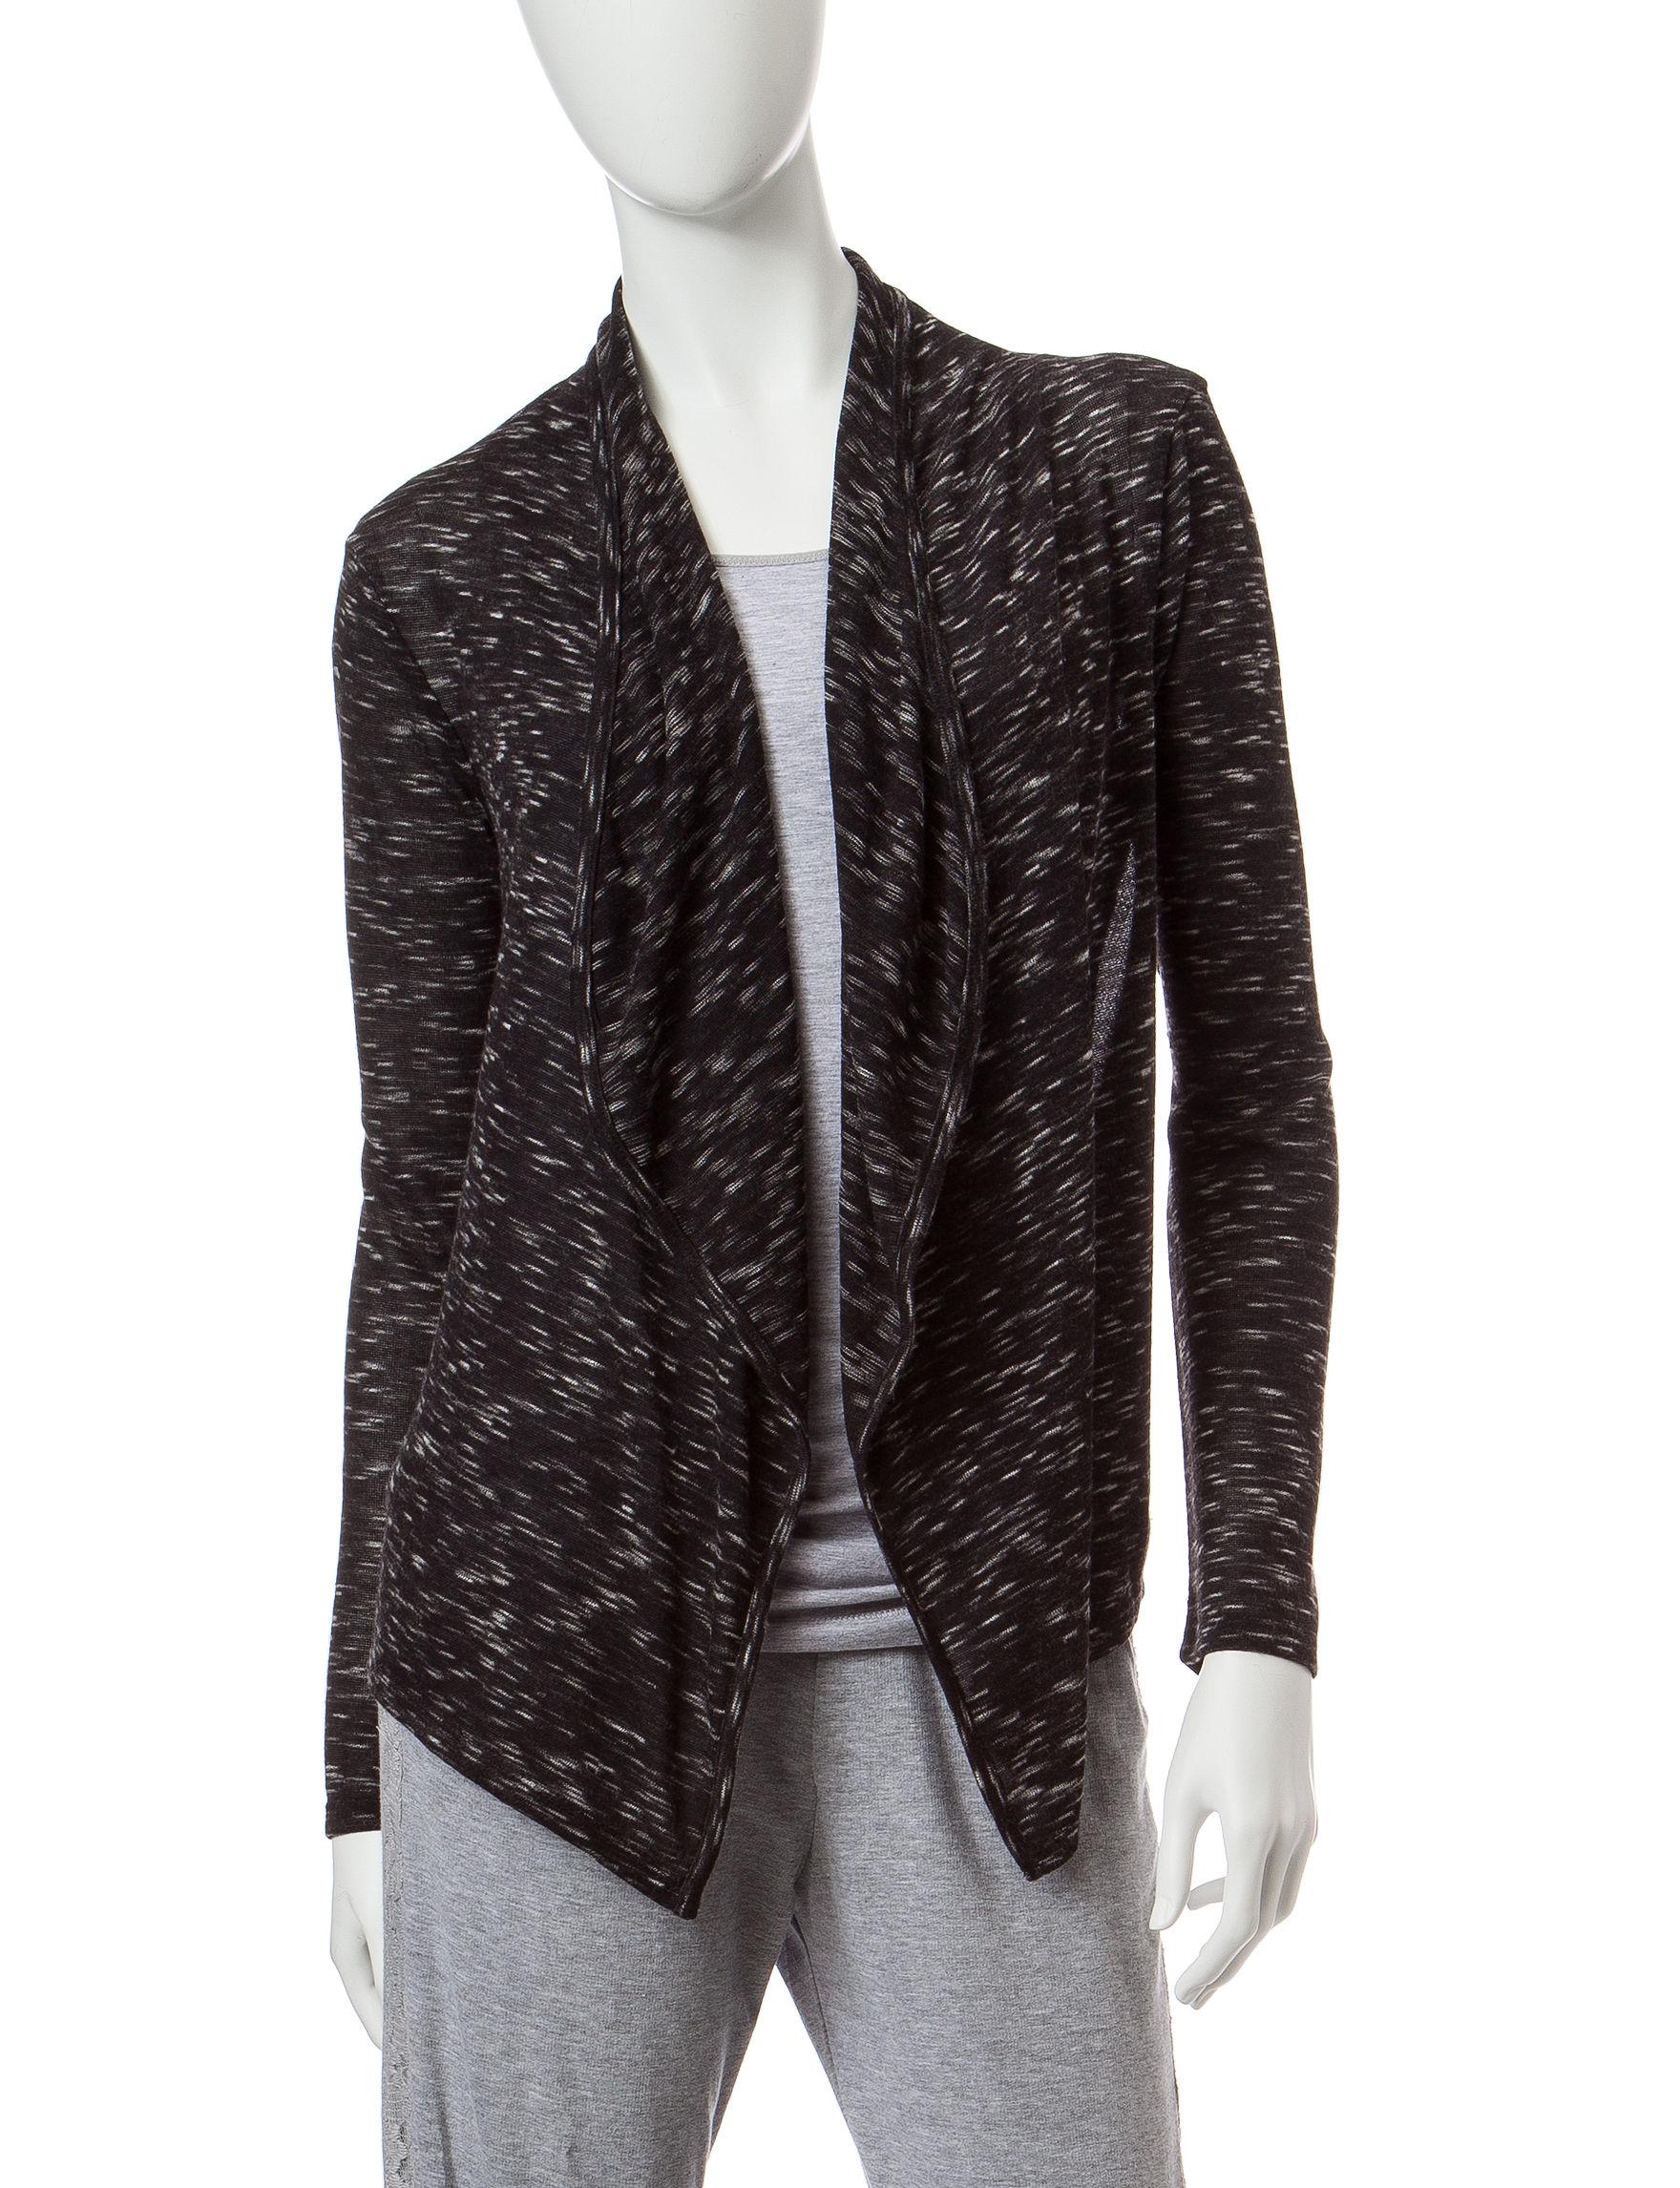 Inspired Hearts Black Lightweight Jackets & Blazers